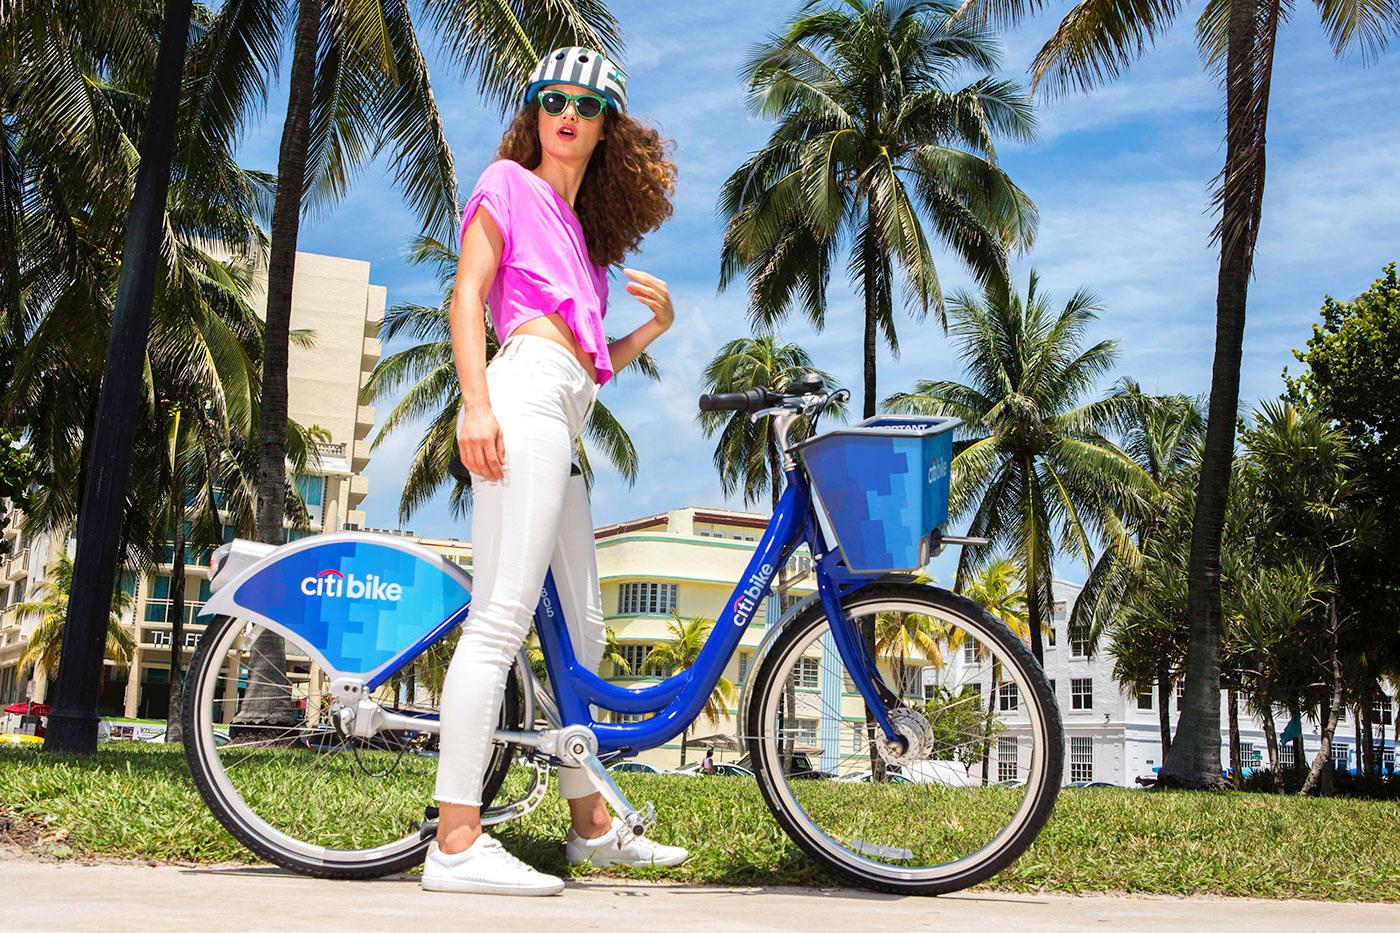 Citi Bike Miami >> Citi Bike Miami 16 Rachel Brownjohn